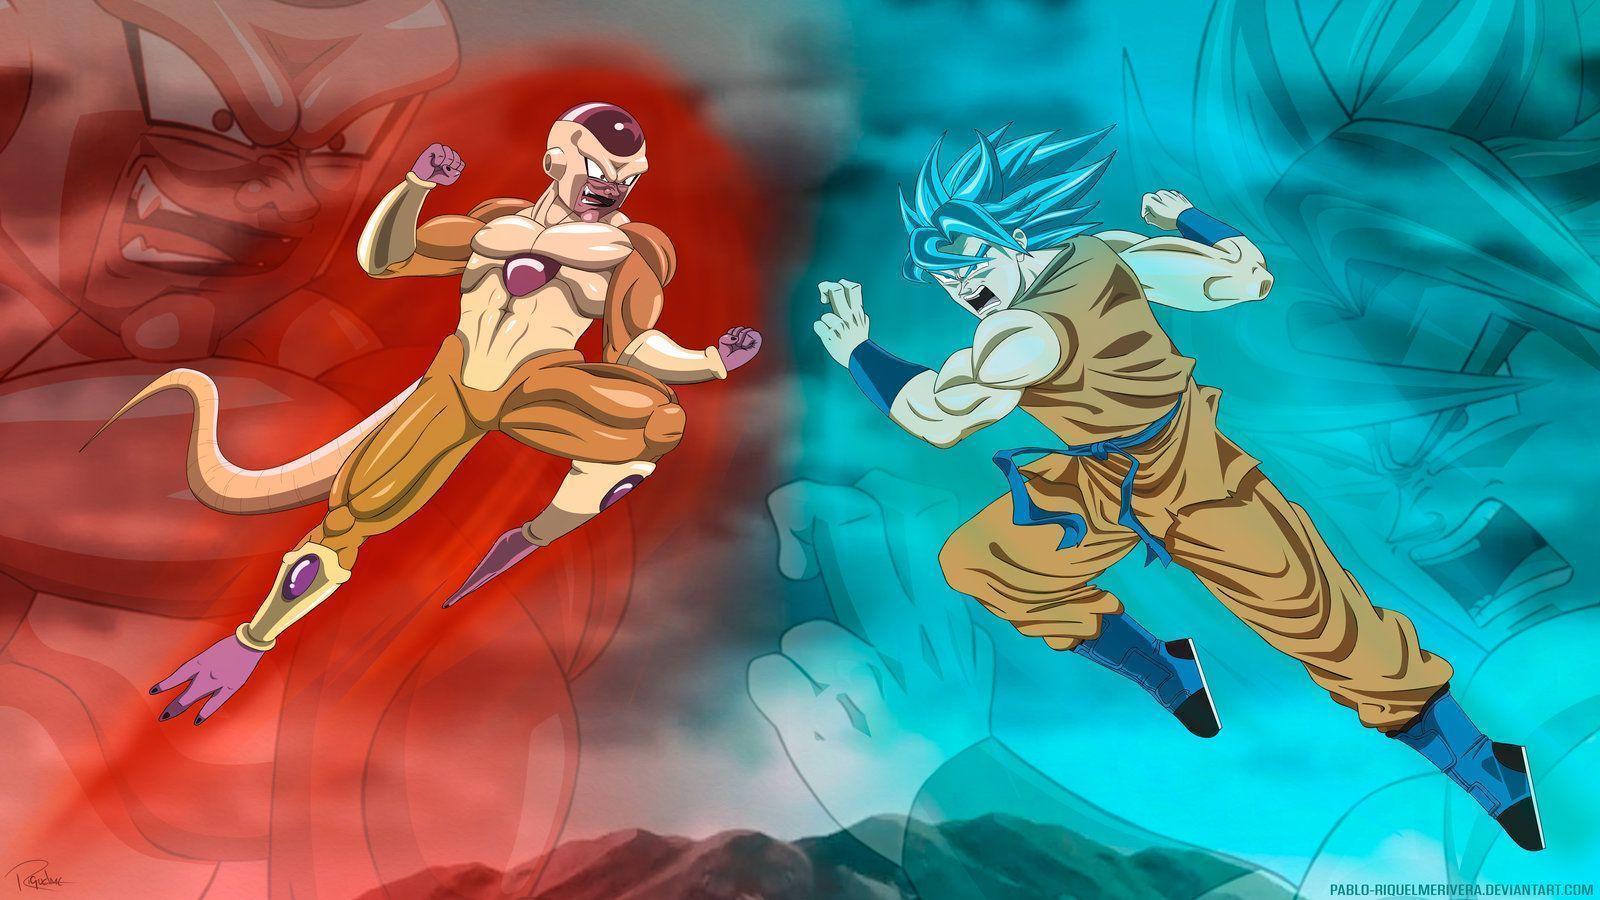 Golden Frieza Vs Goku Super Saiyan God By Pablo RiquelmeRivera On